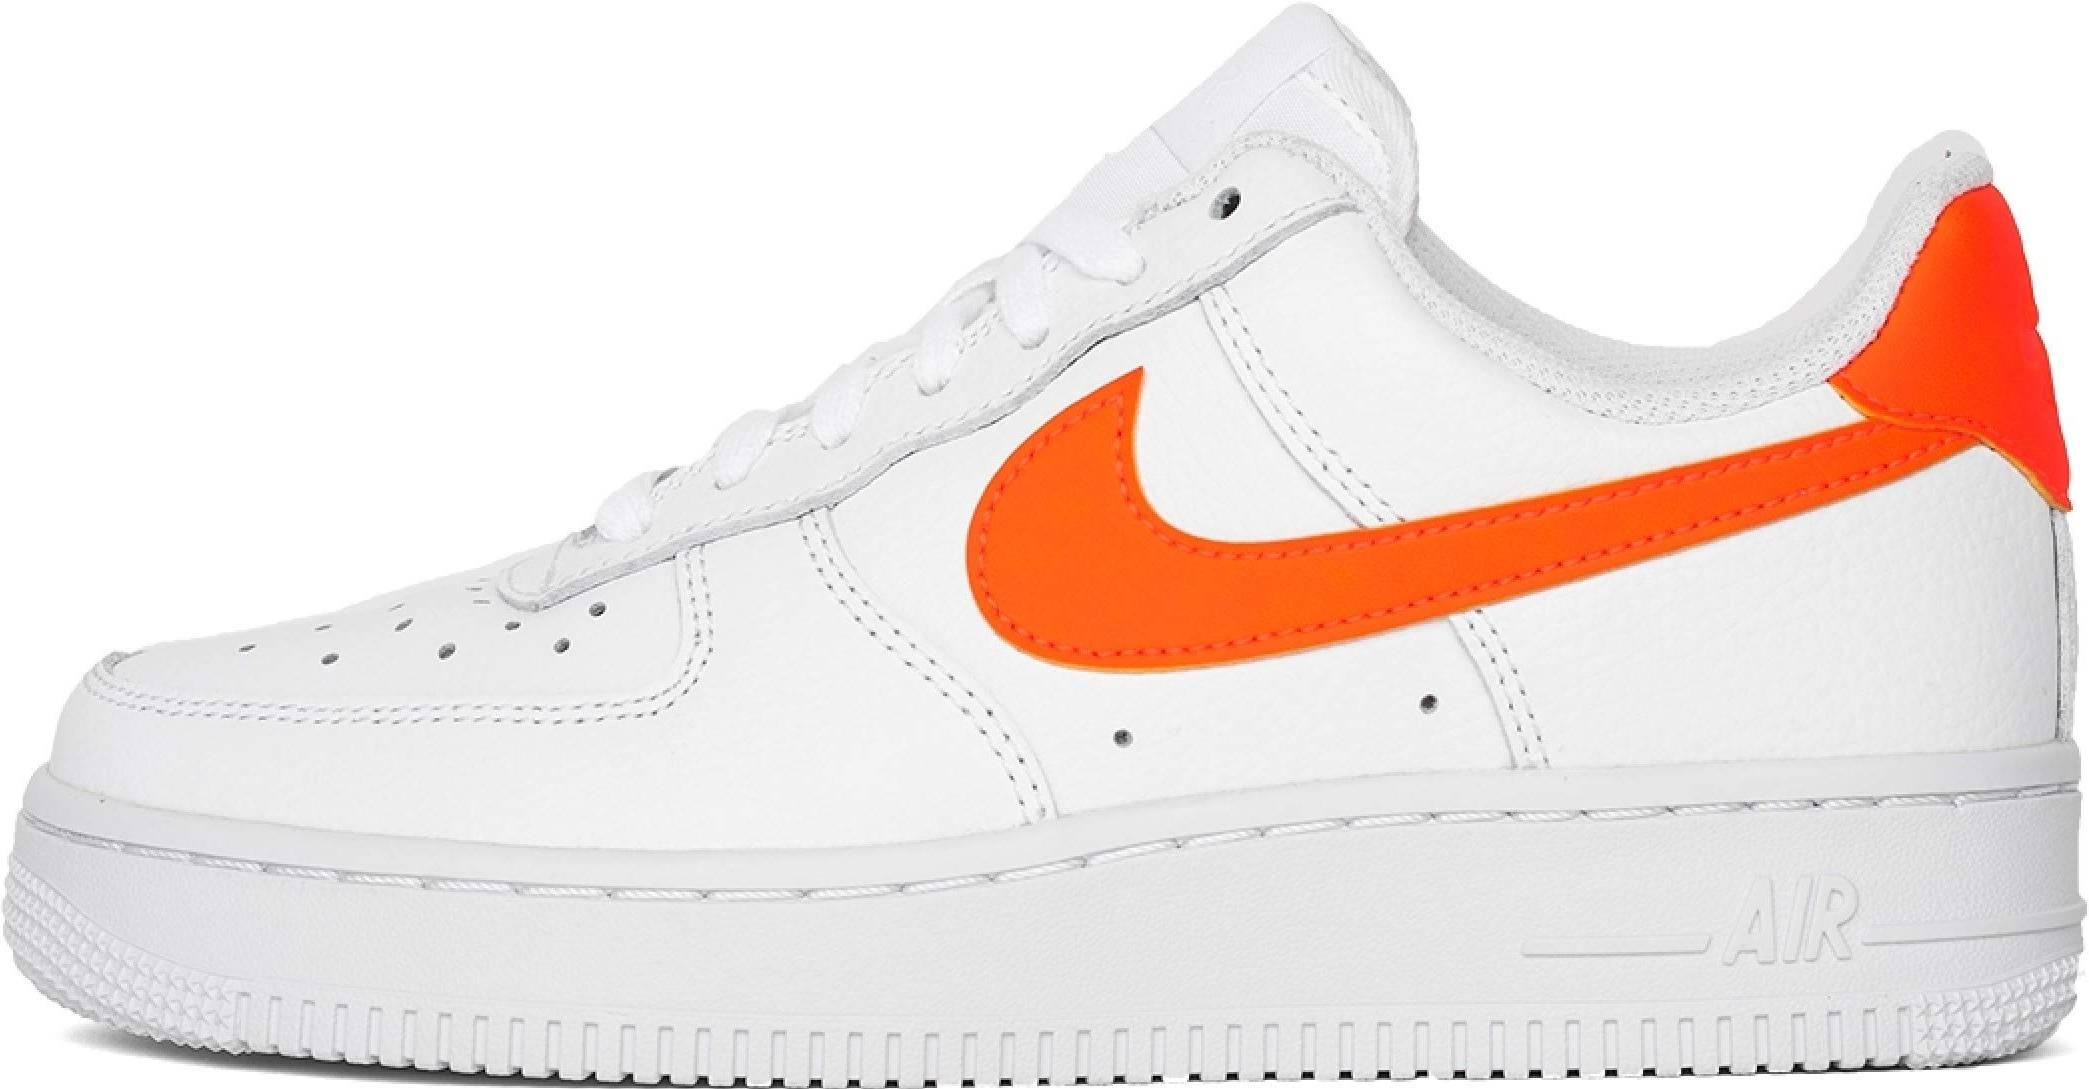 Nike Air Force 1 07 Patent